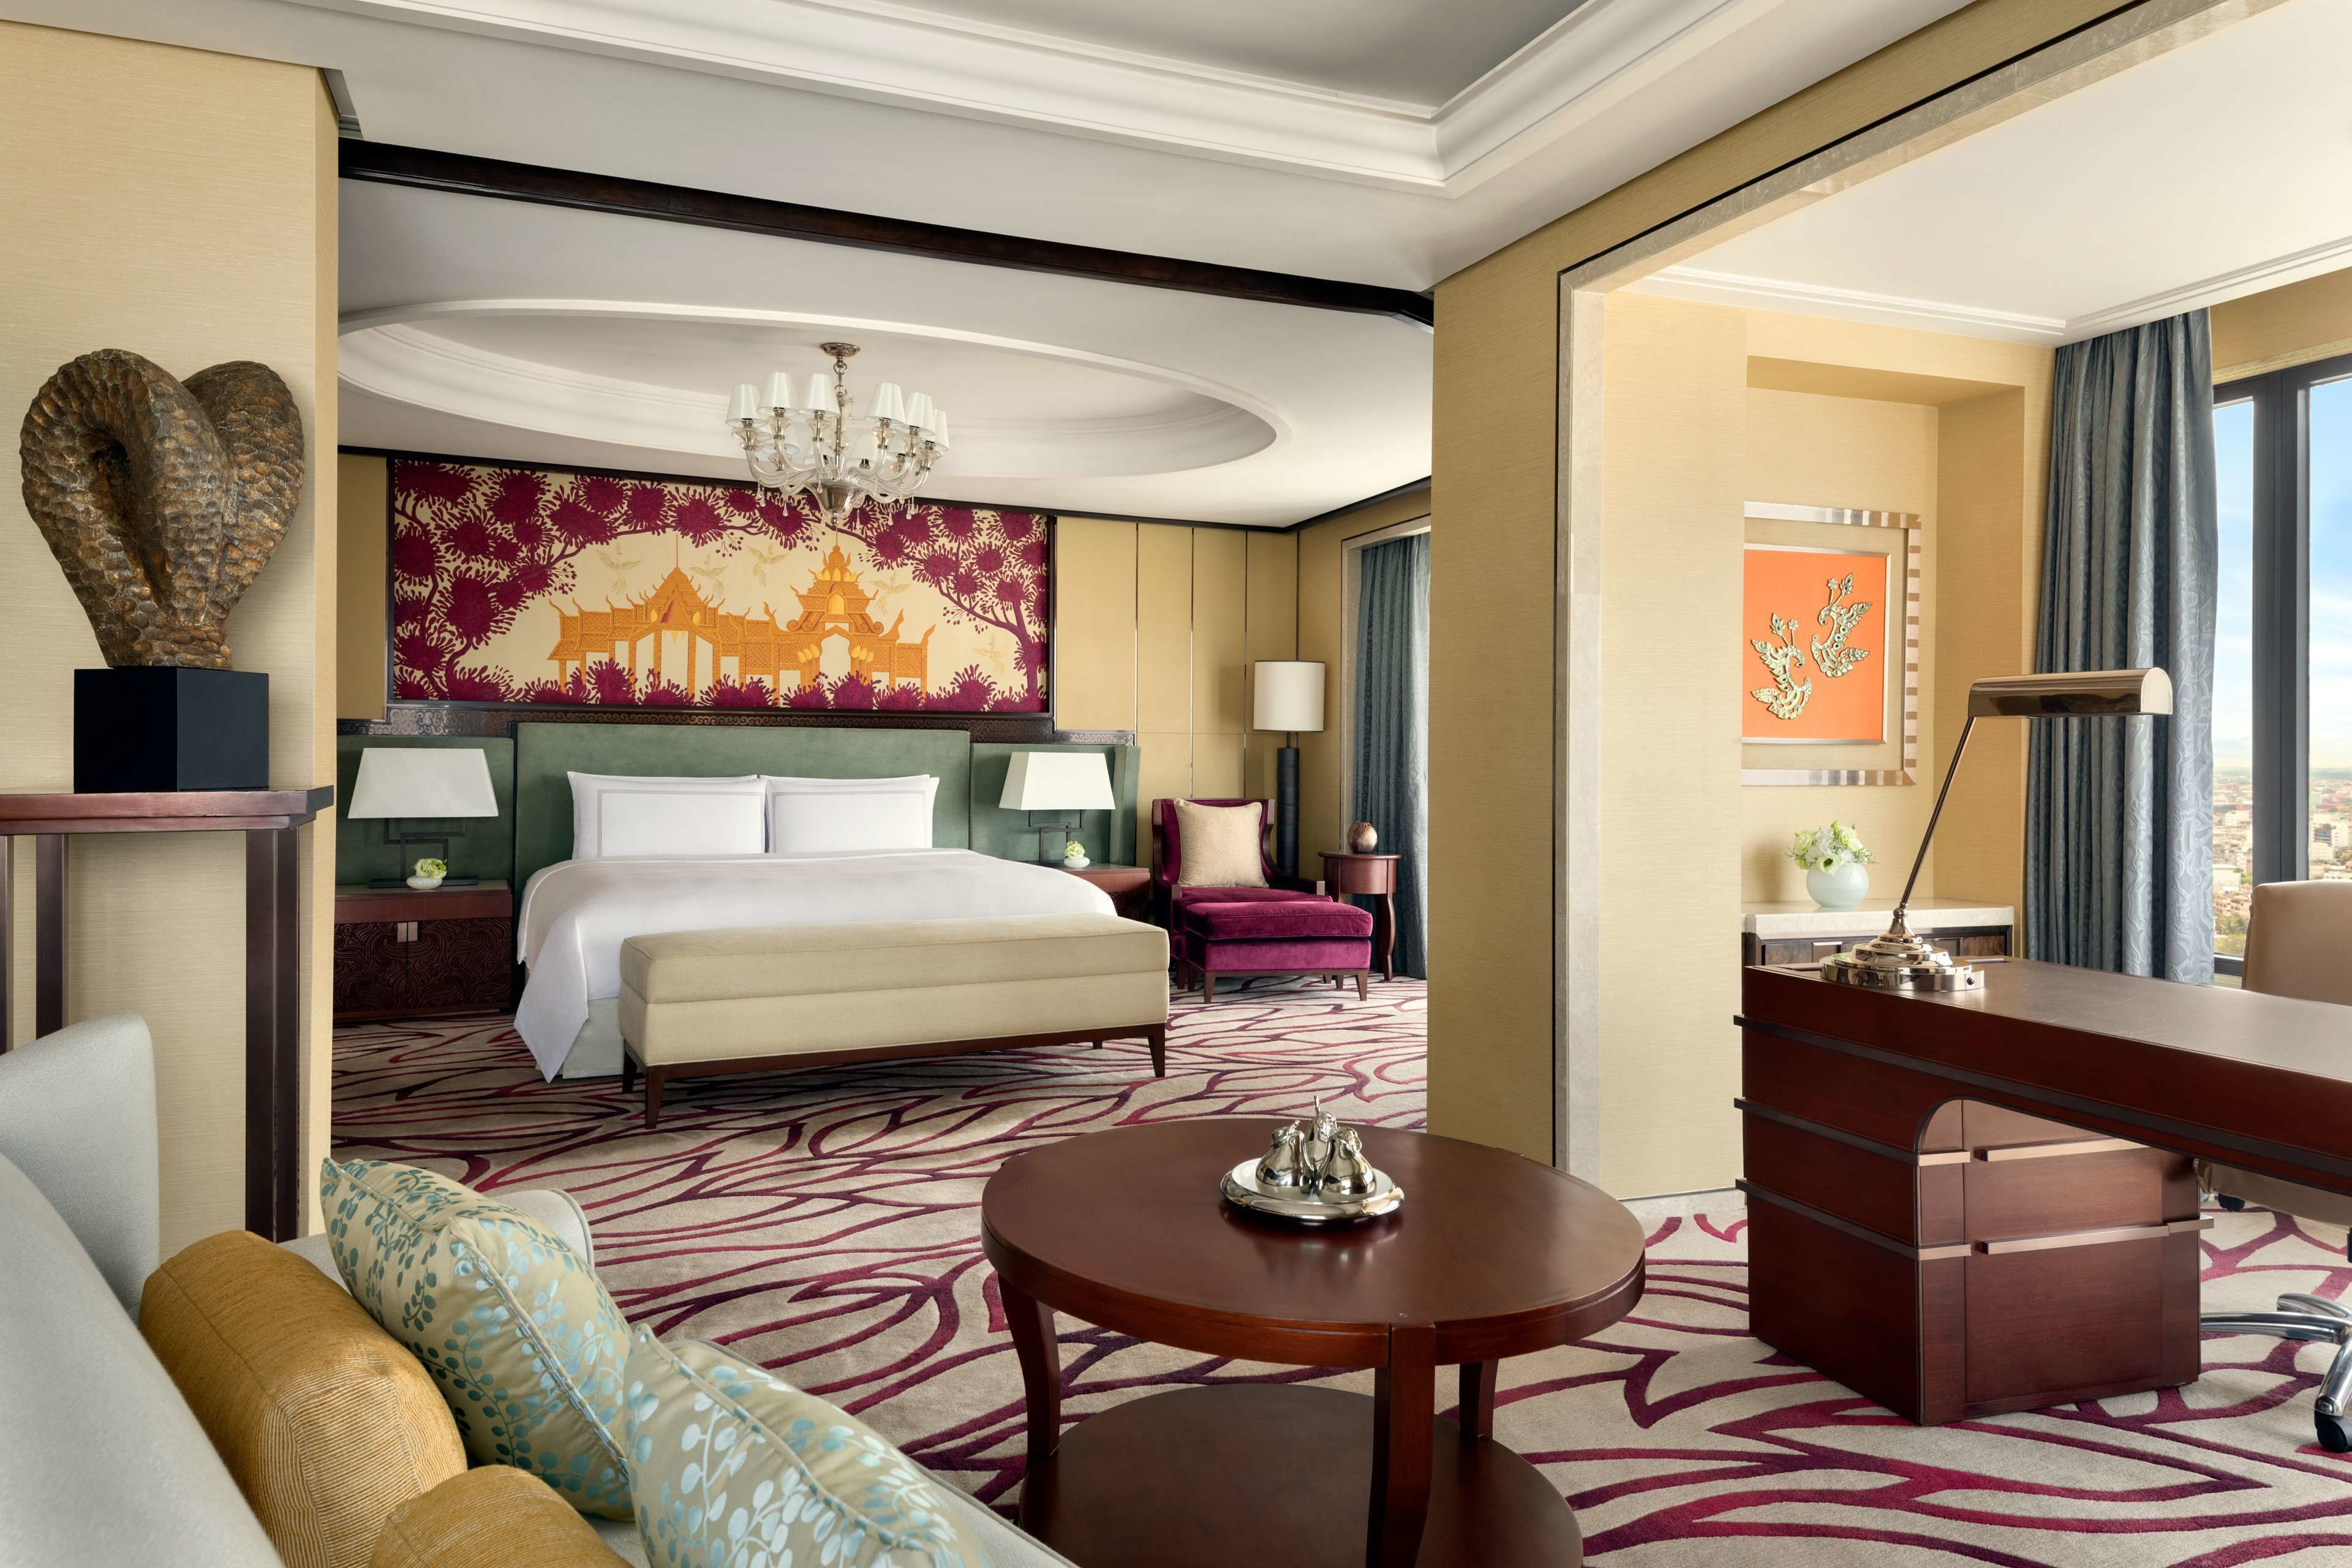 Courtesy of Shangri-La Hotel / Expedia